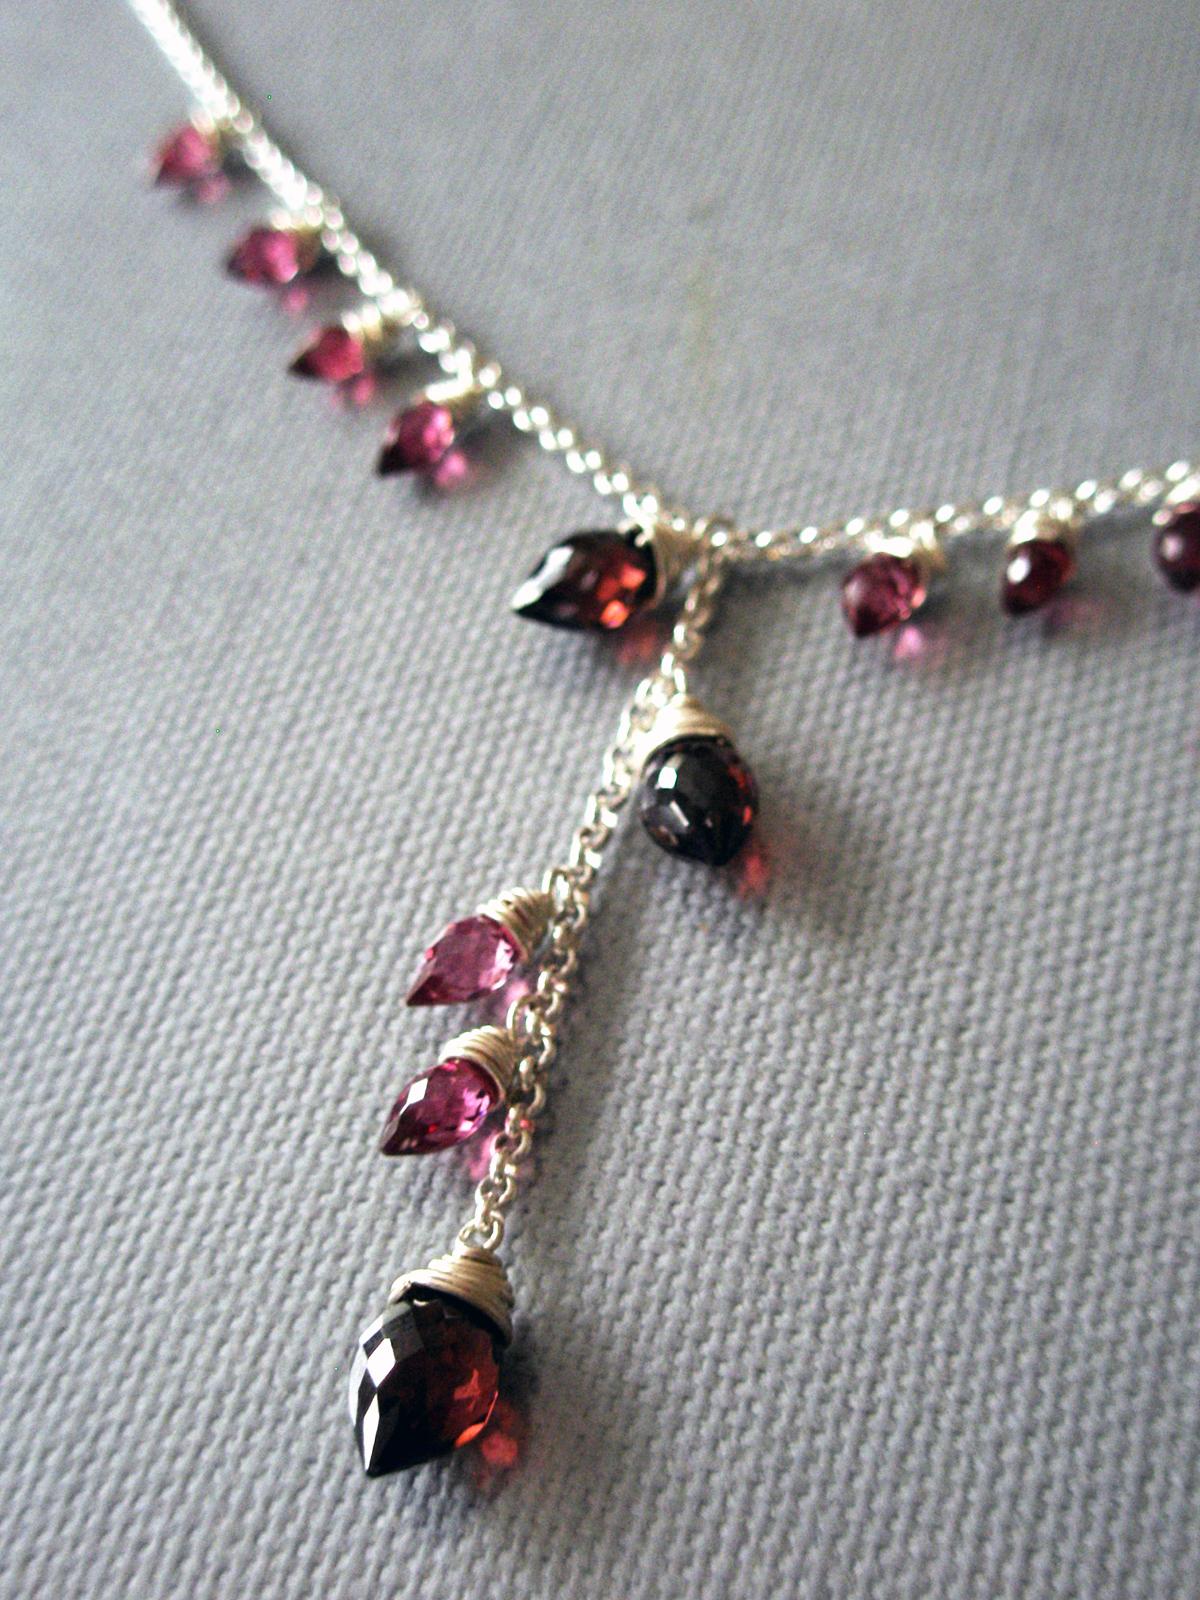 Budding Roses 2007  Necklace & Earrings  Garnet, Sterling Silver